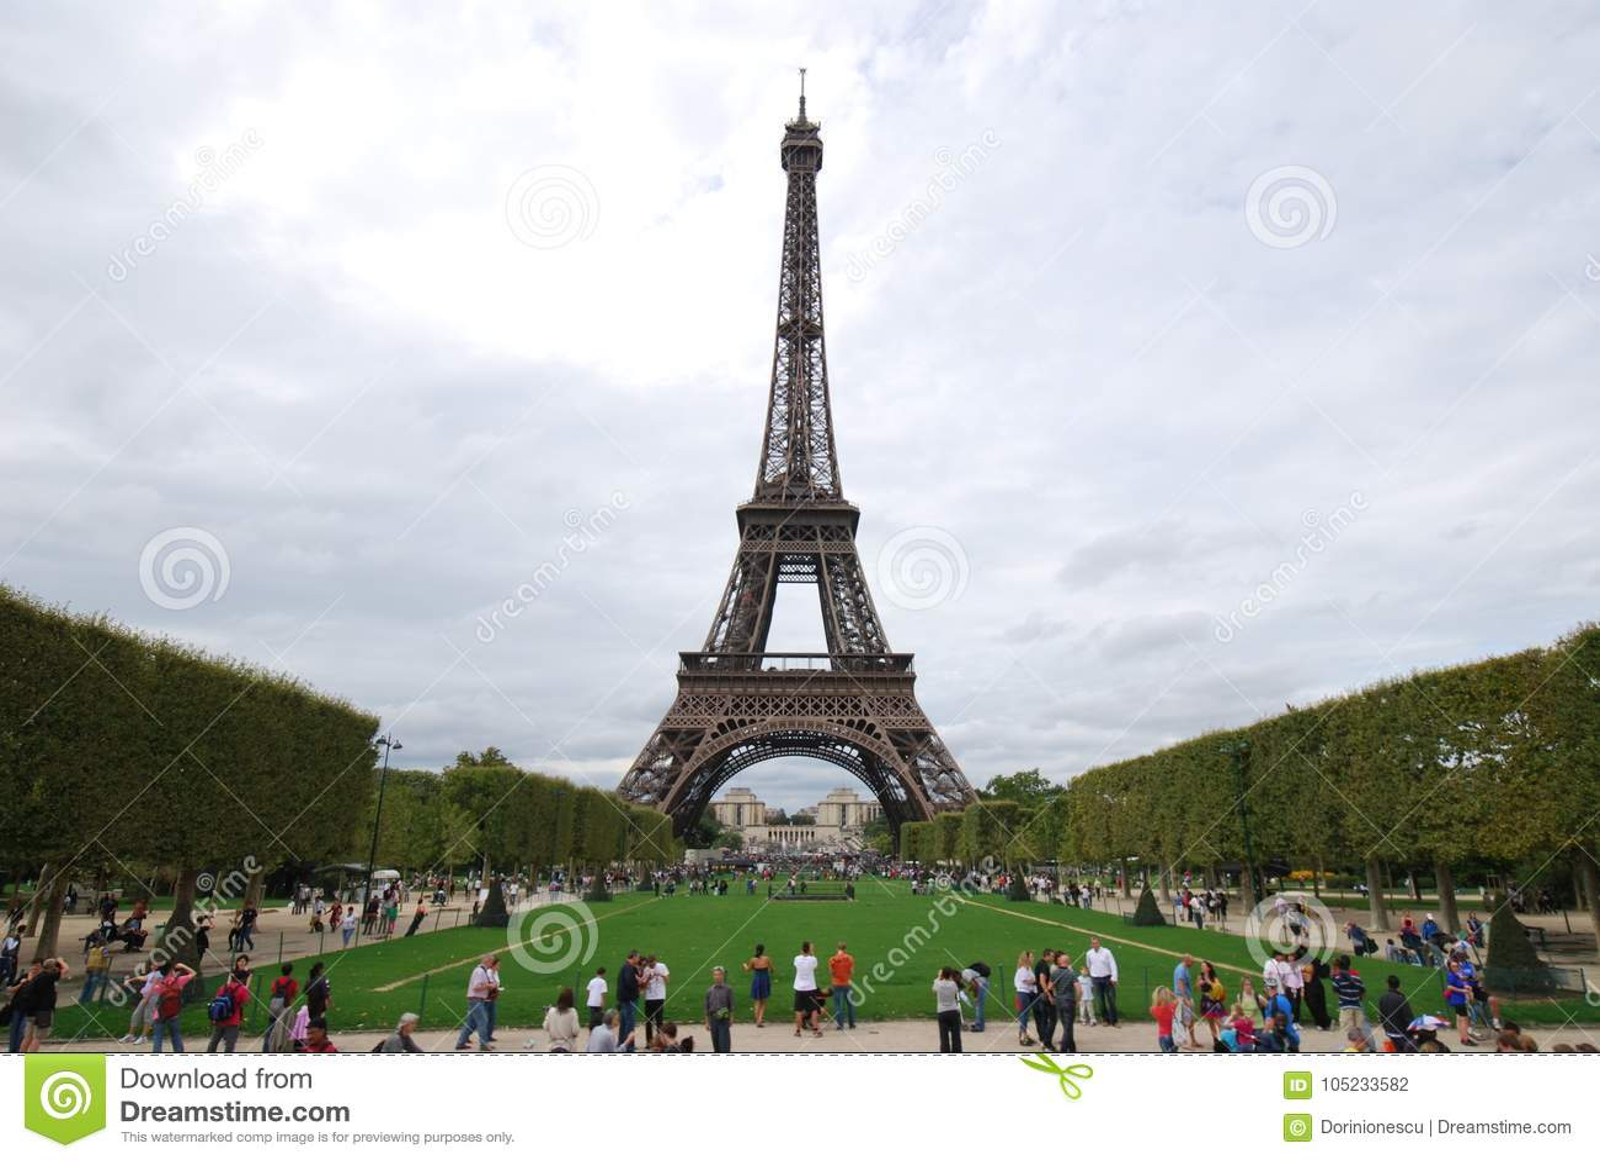 Torre Eiffel, torre Eiffel, marco, marco histórico nacional, torre, céu